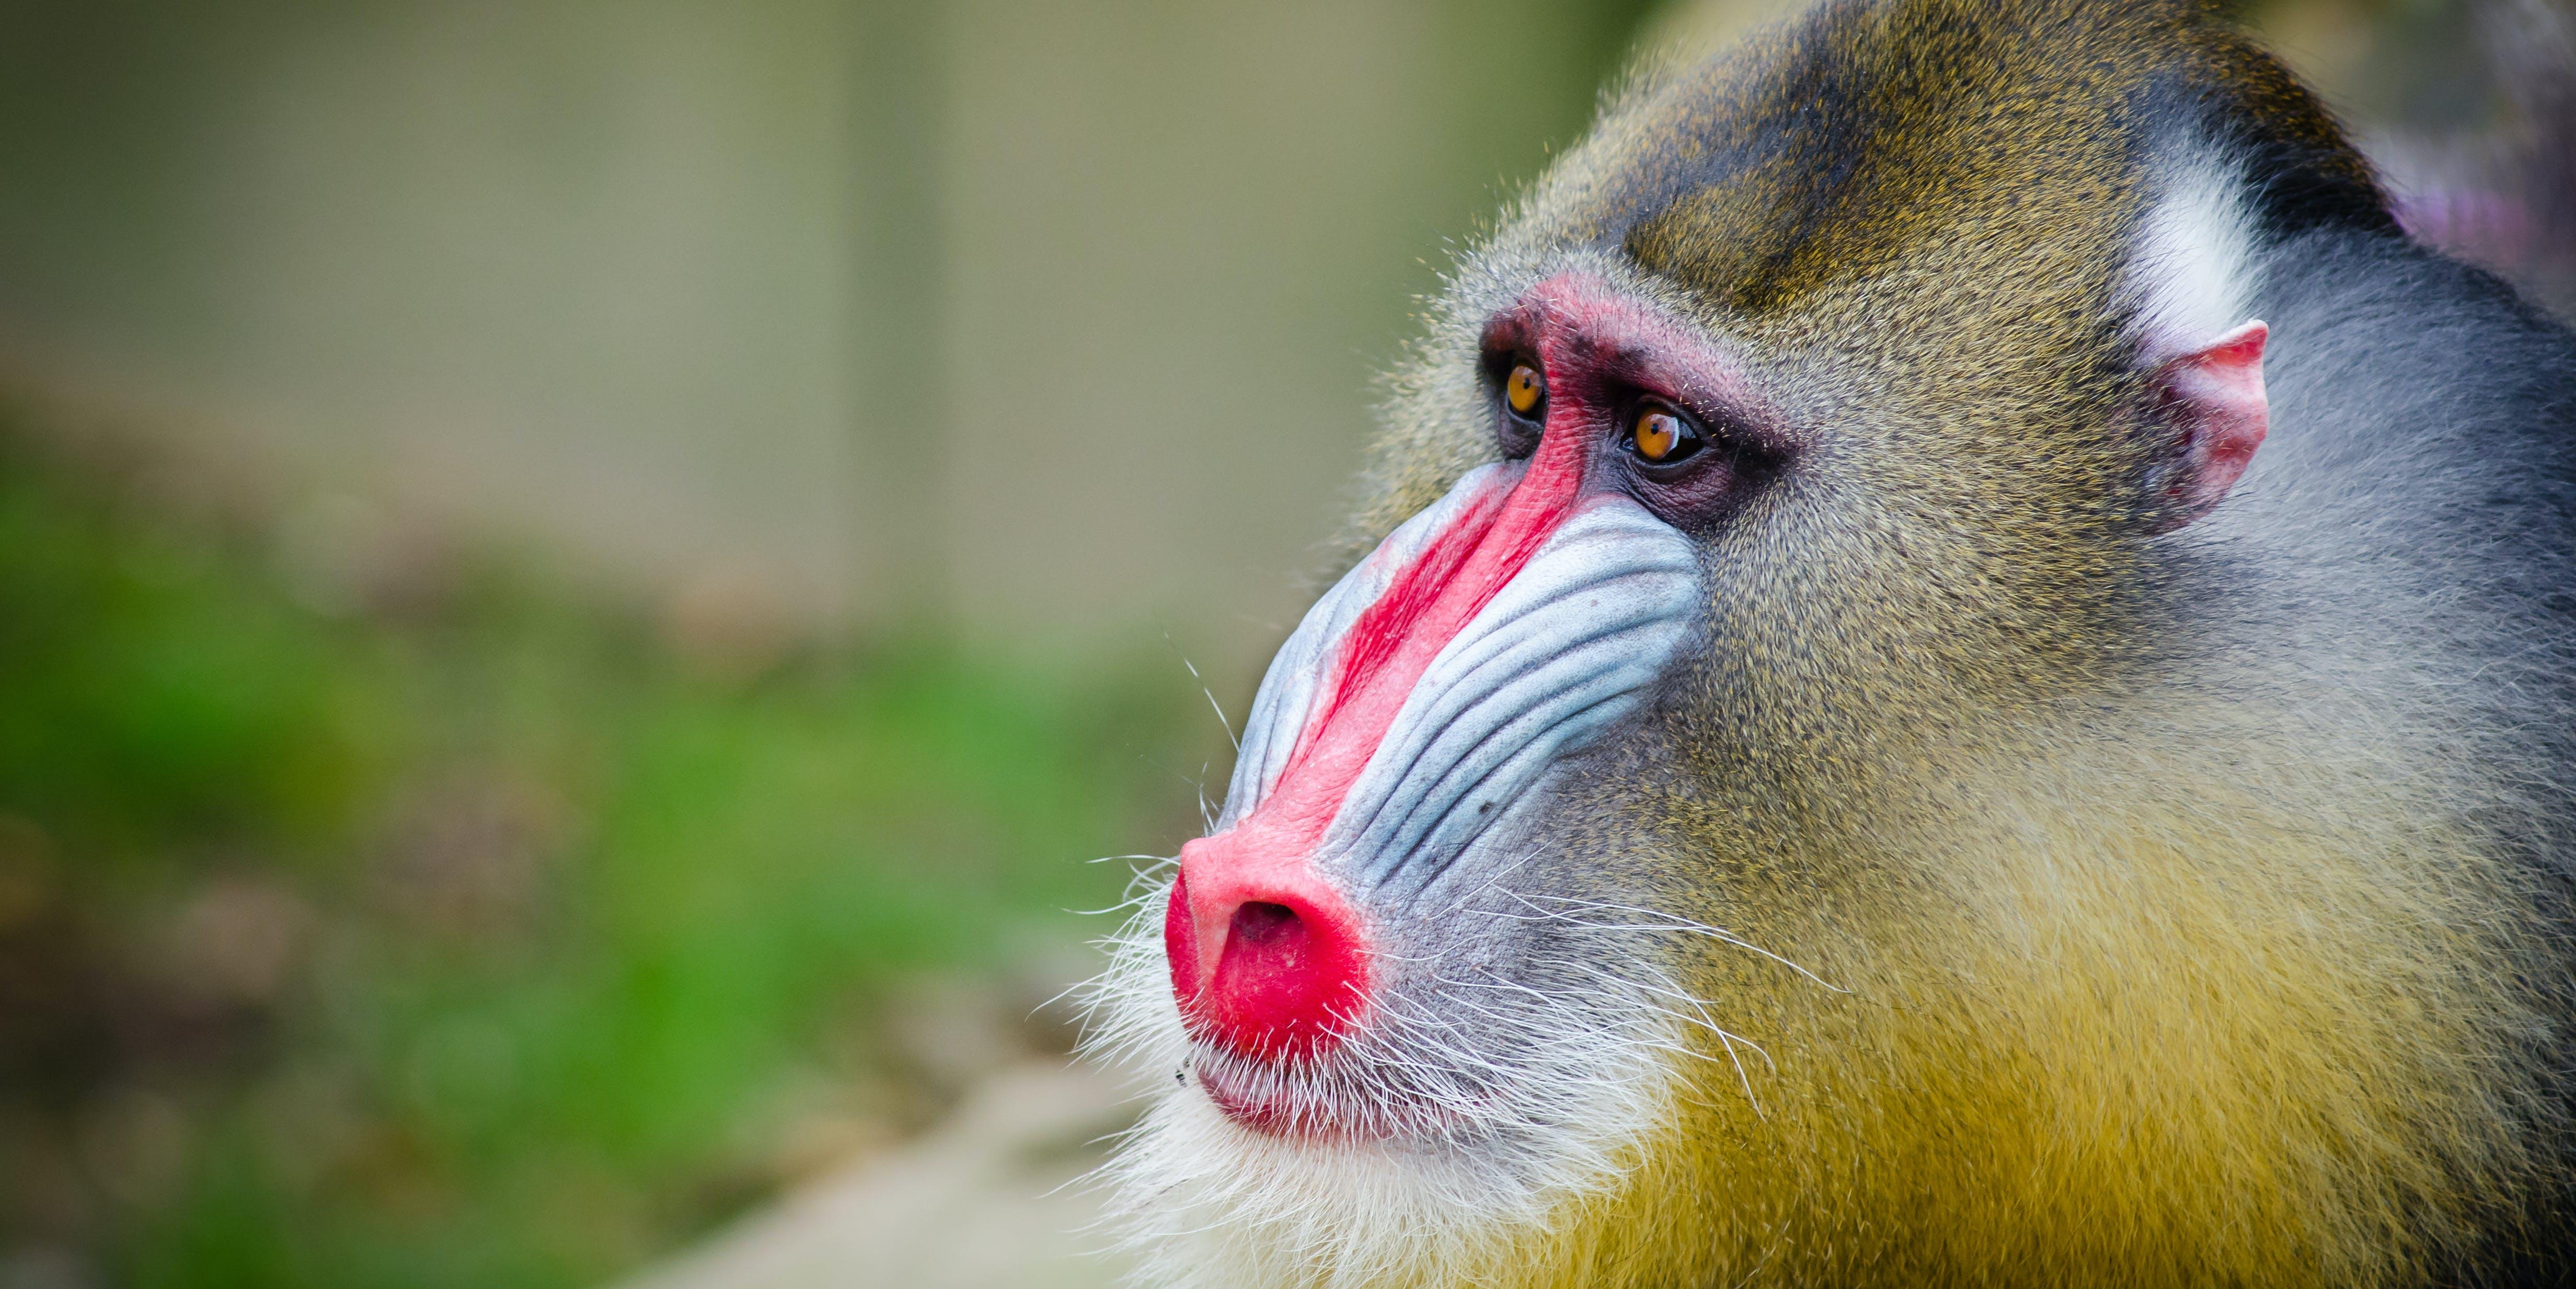 mandrill poop fecal matter monkey primate social behavior